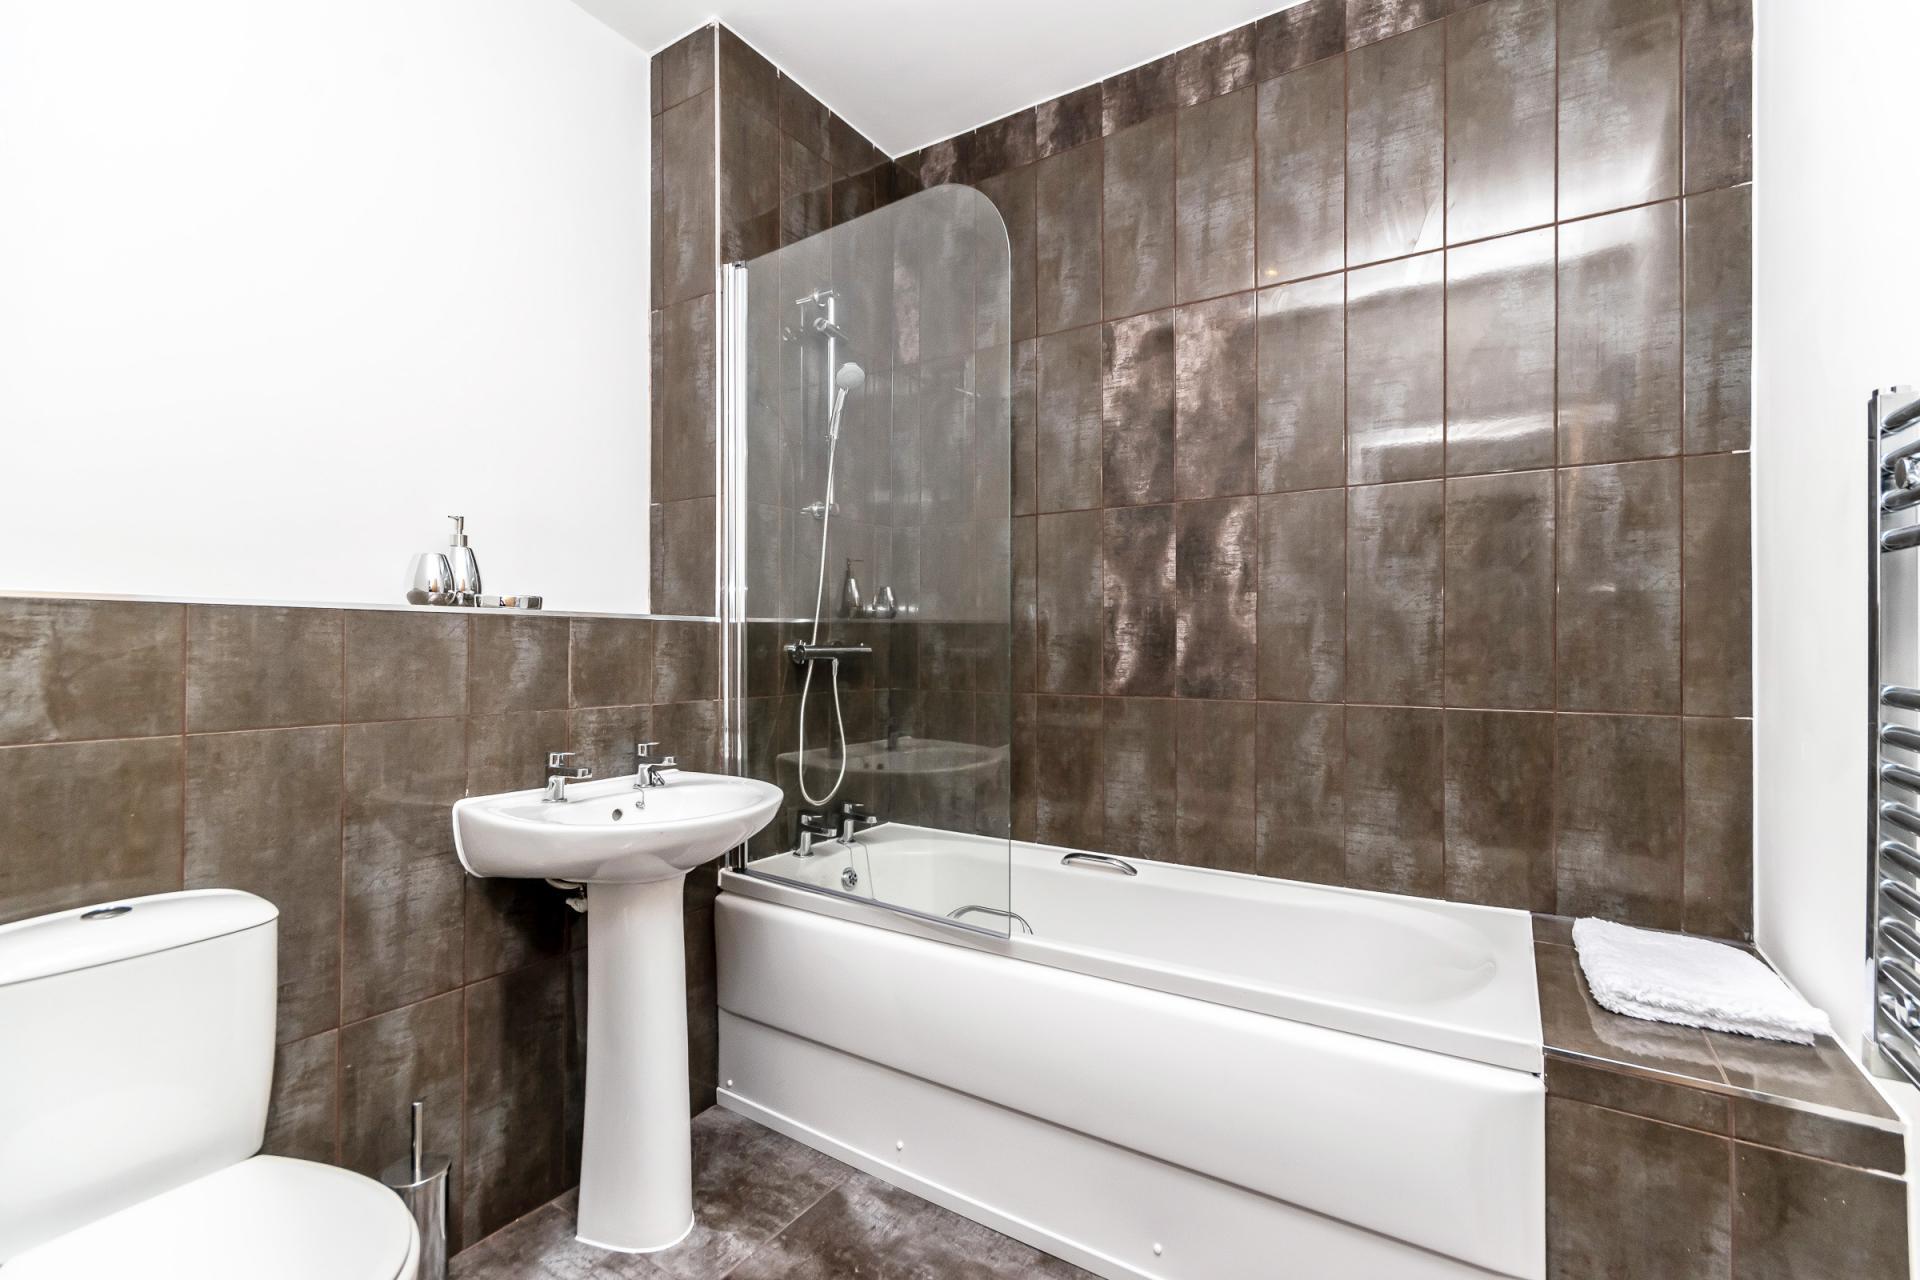 Bathroom at City Suites Apartments